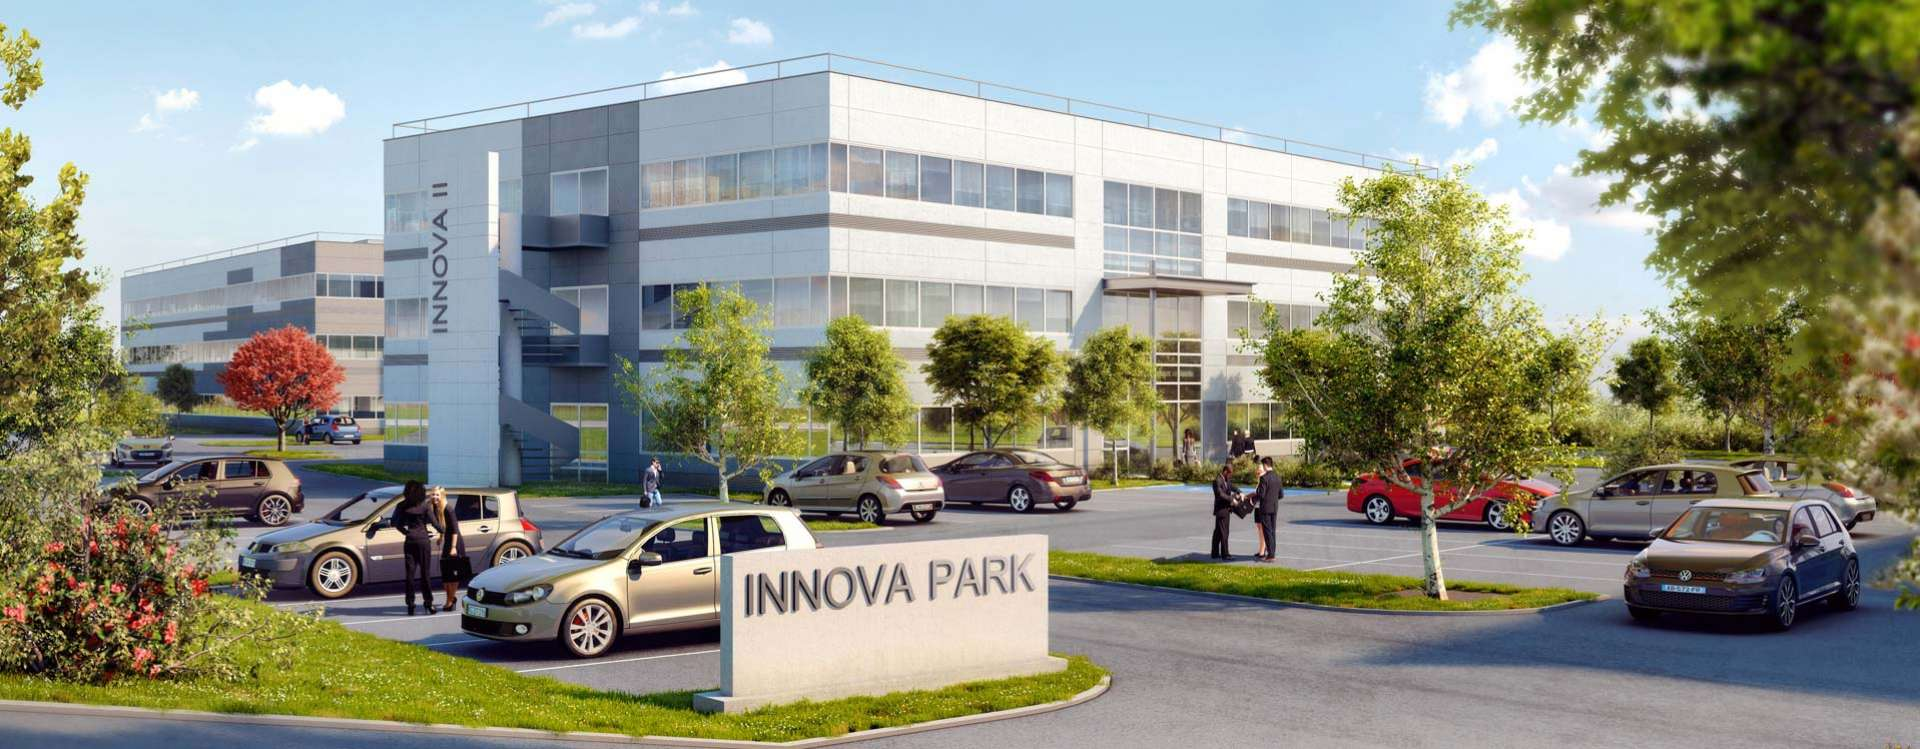 InnovaPark, 3 leasehold office buildings in Vaulx Milieu, in Isère